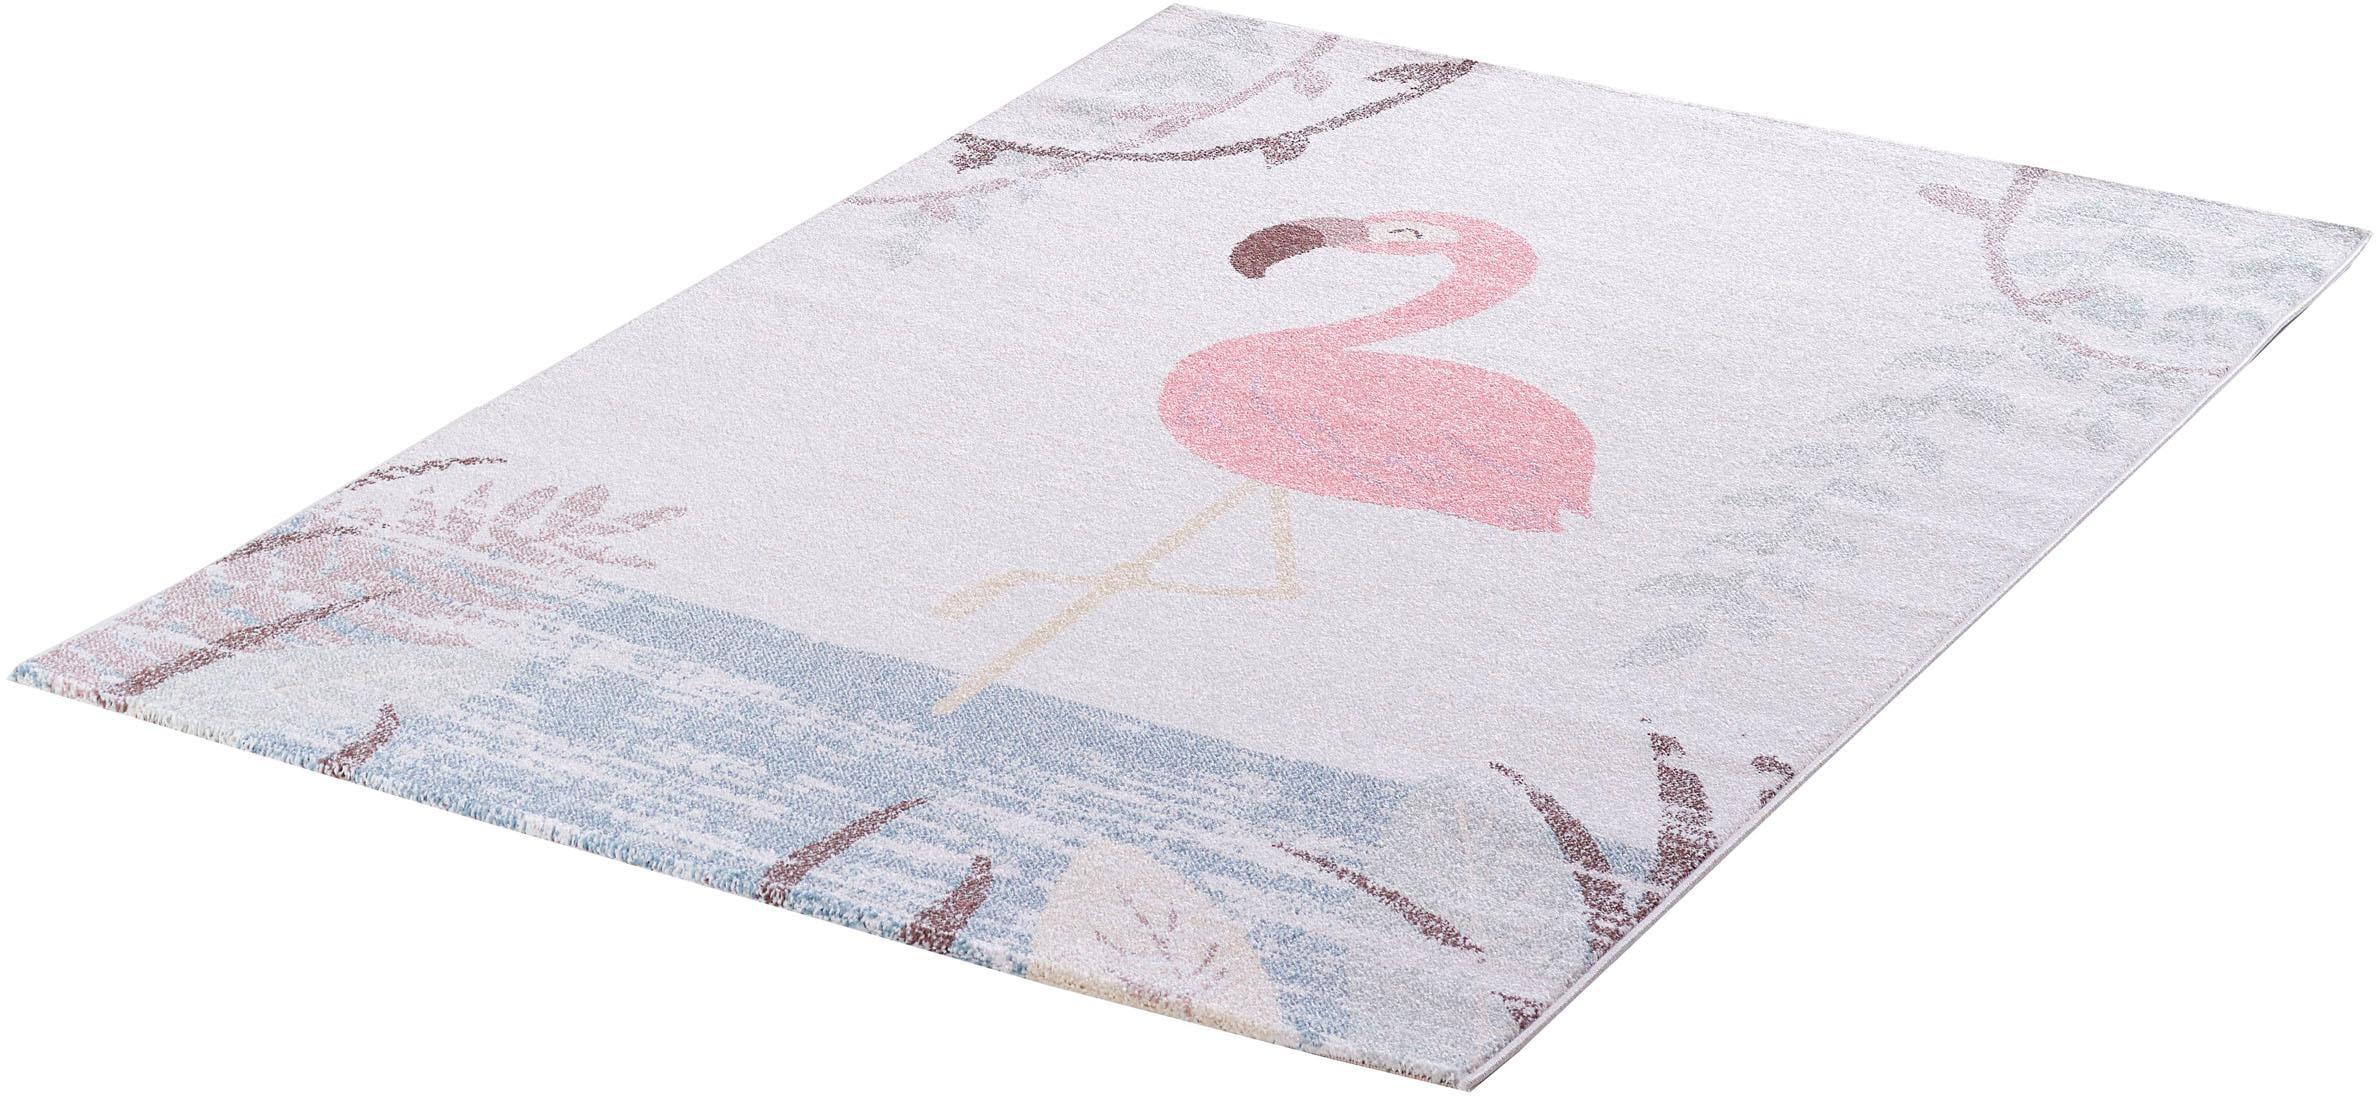 Kinderteppich Luna Kids 4610 Sanat Teppiche rechteckig Höhe 12 mm maschinell gewebt